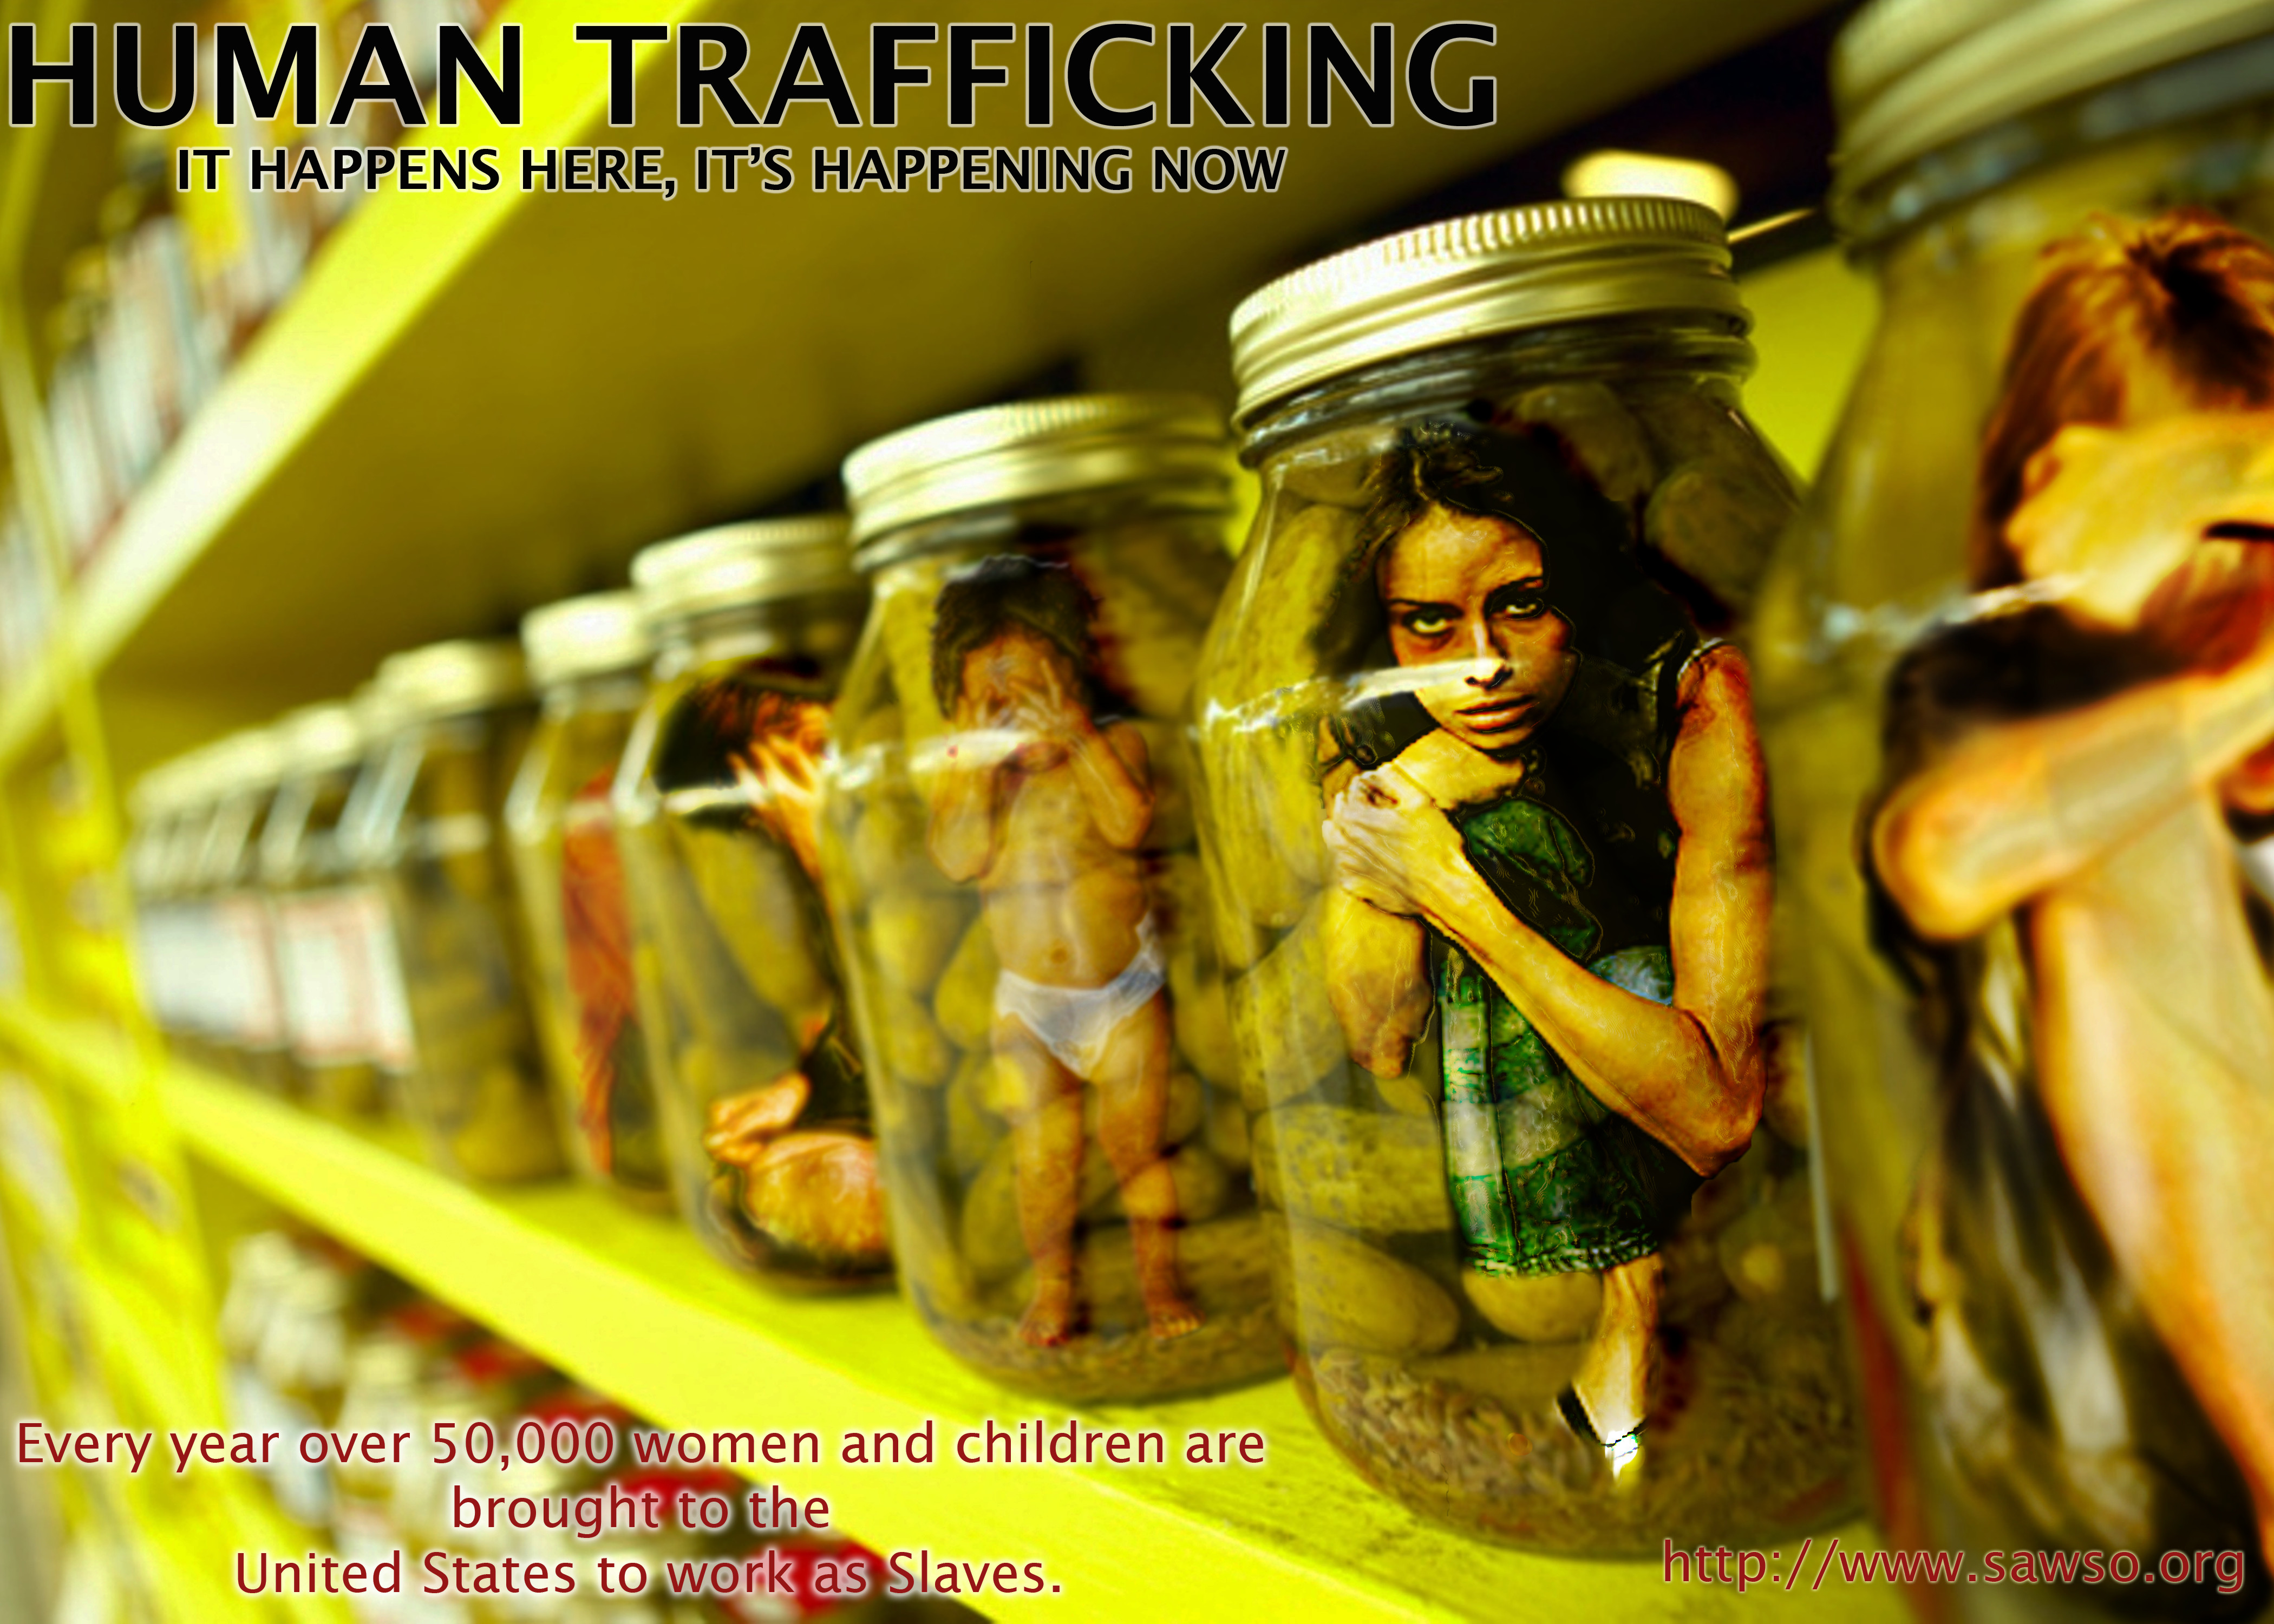 Human trafficking policy?